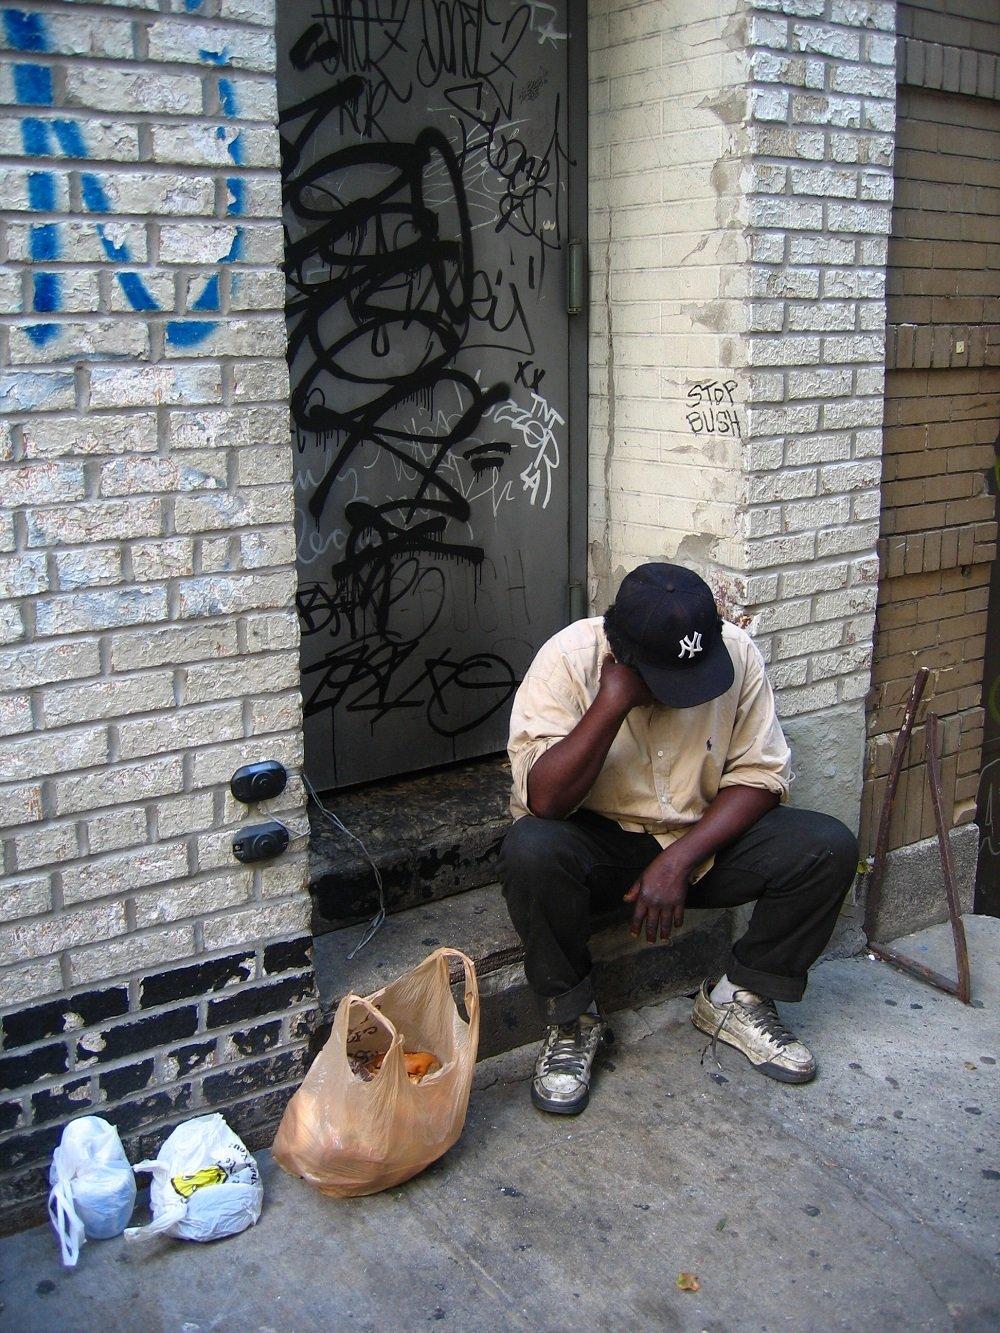 Un sans-abri.   Image : Wikimedia Commons